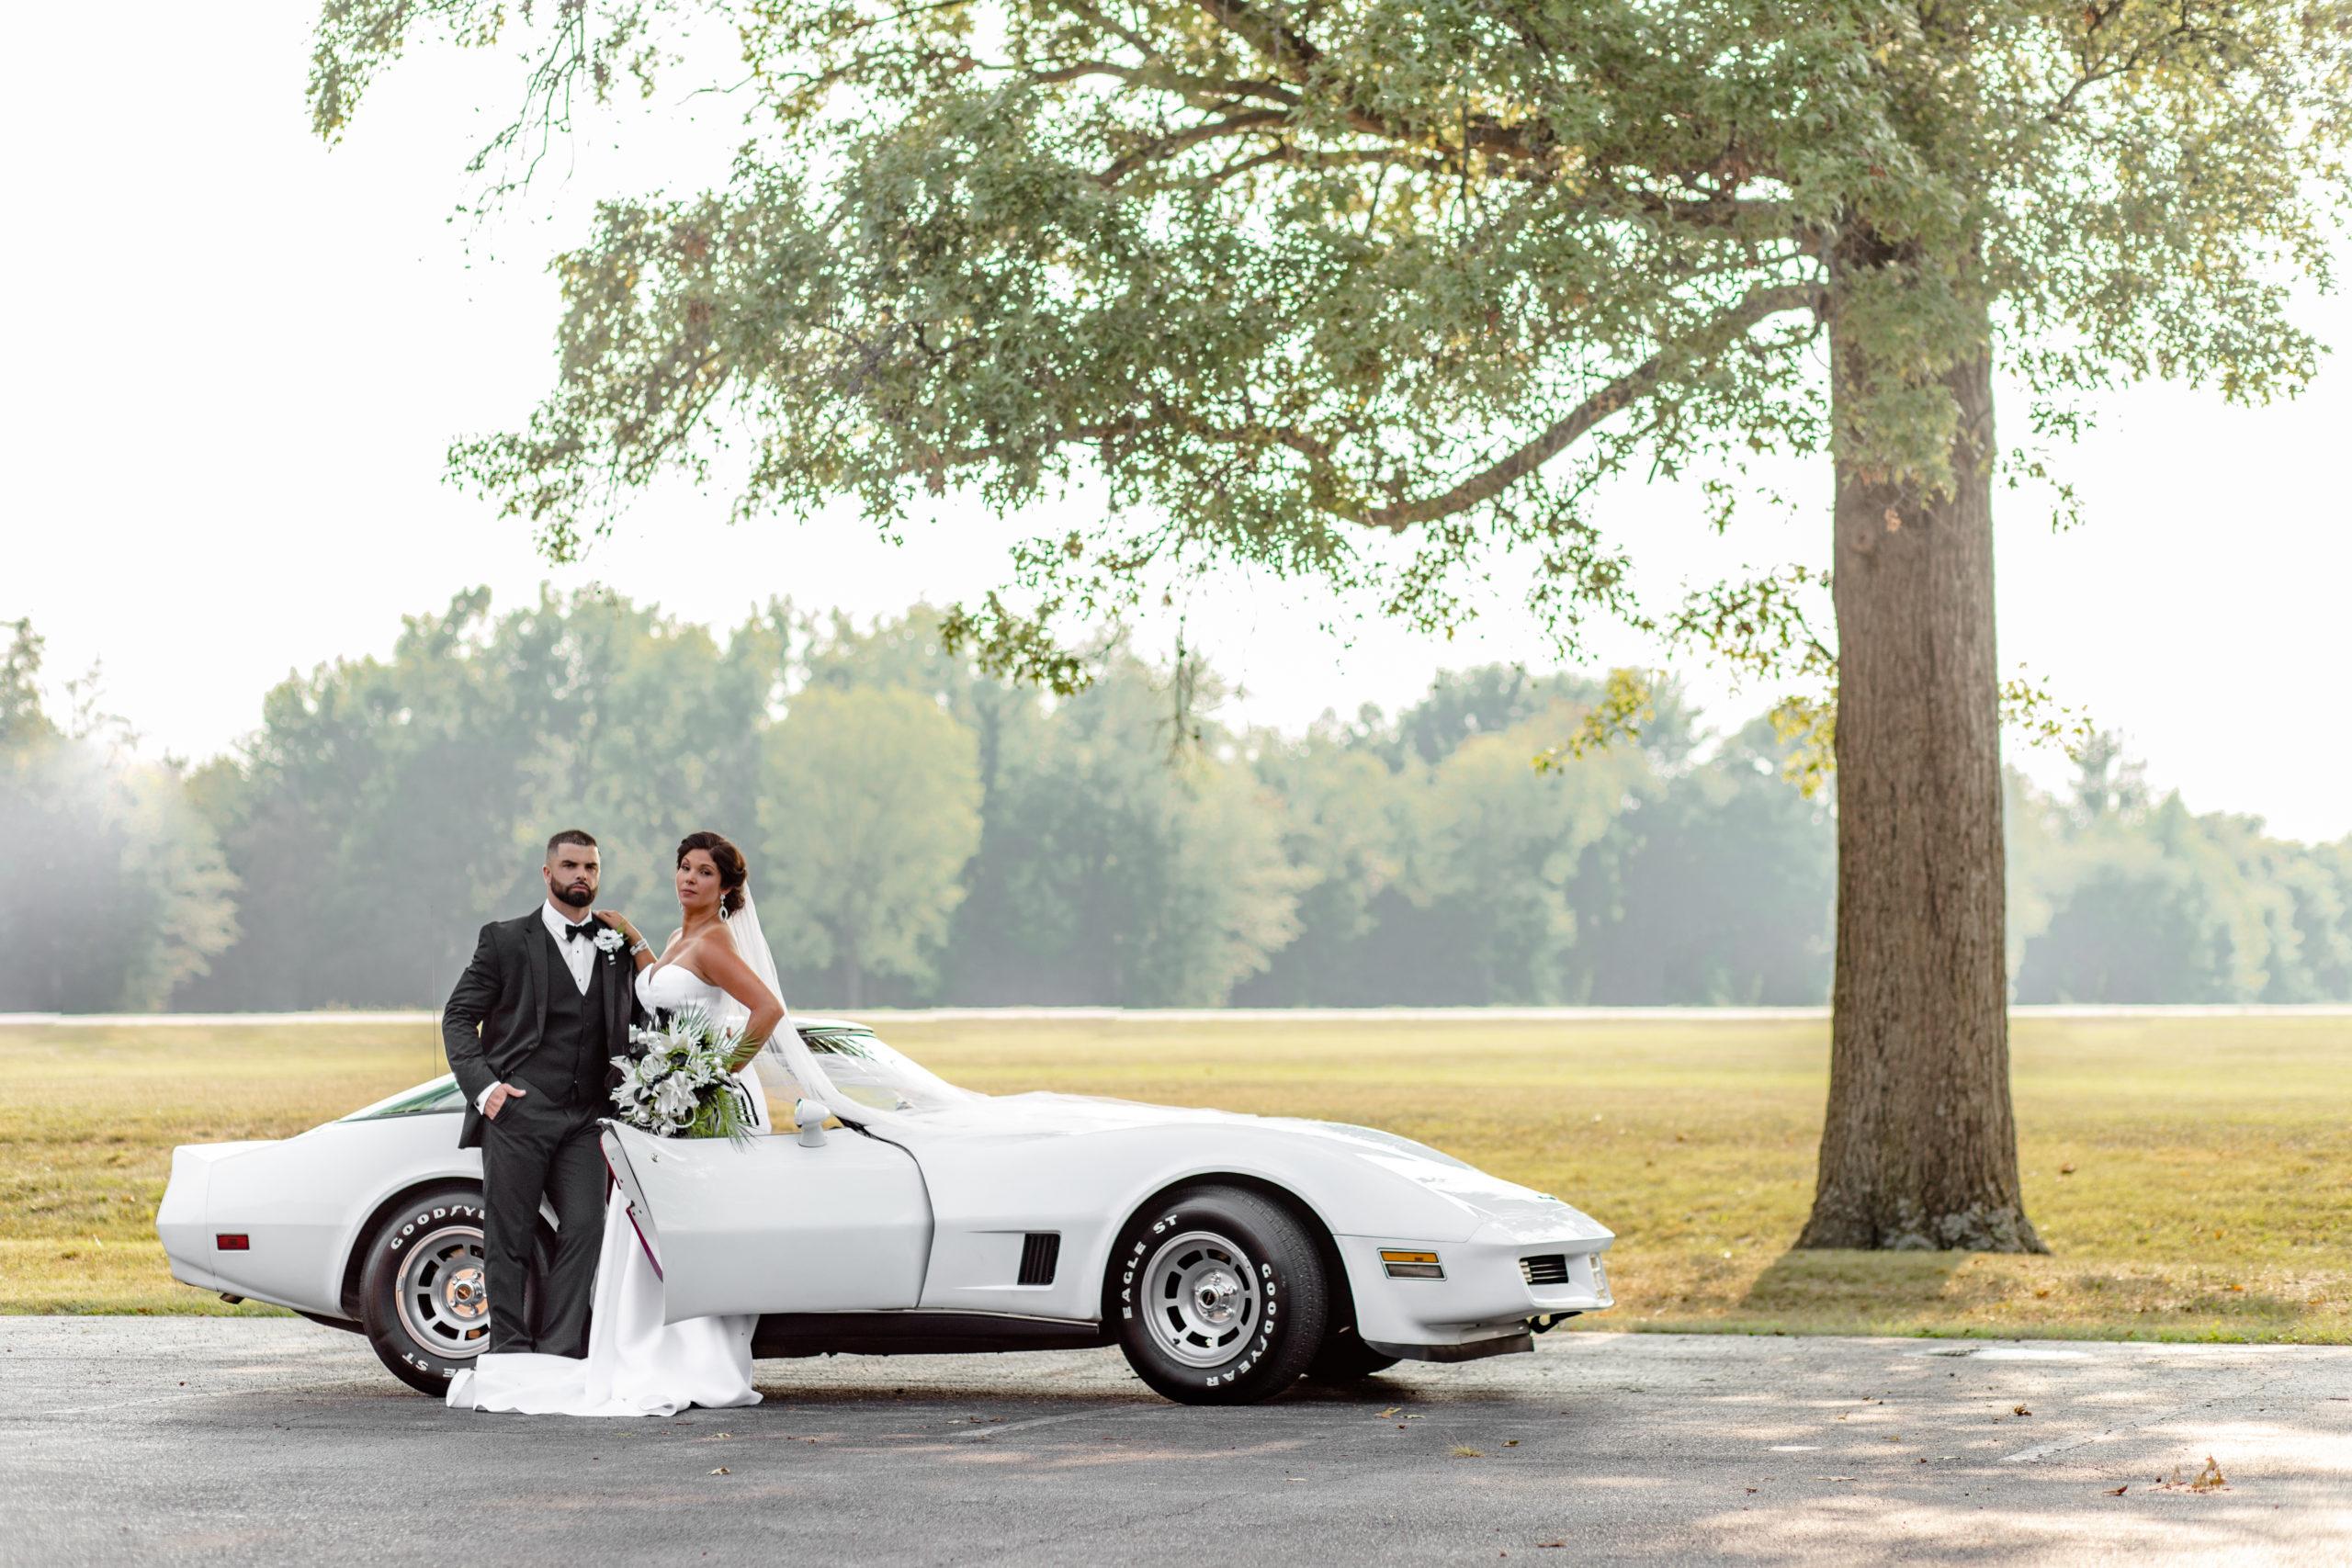 wedding photography, vintage car, corvette, bride and groom, elegant wedding portrait